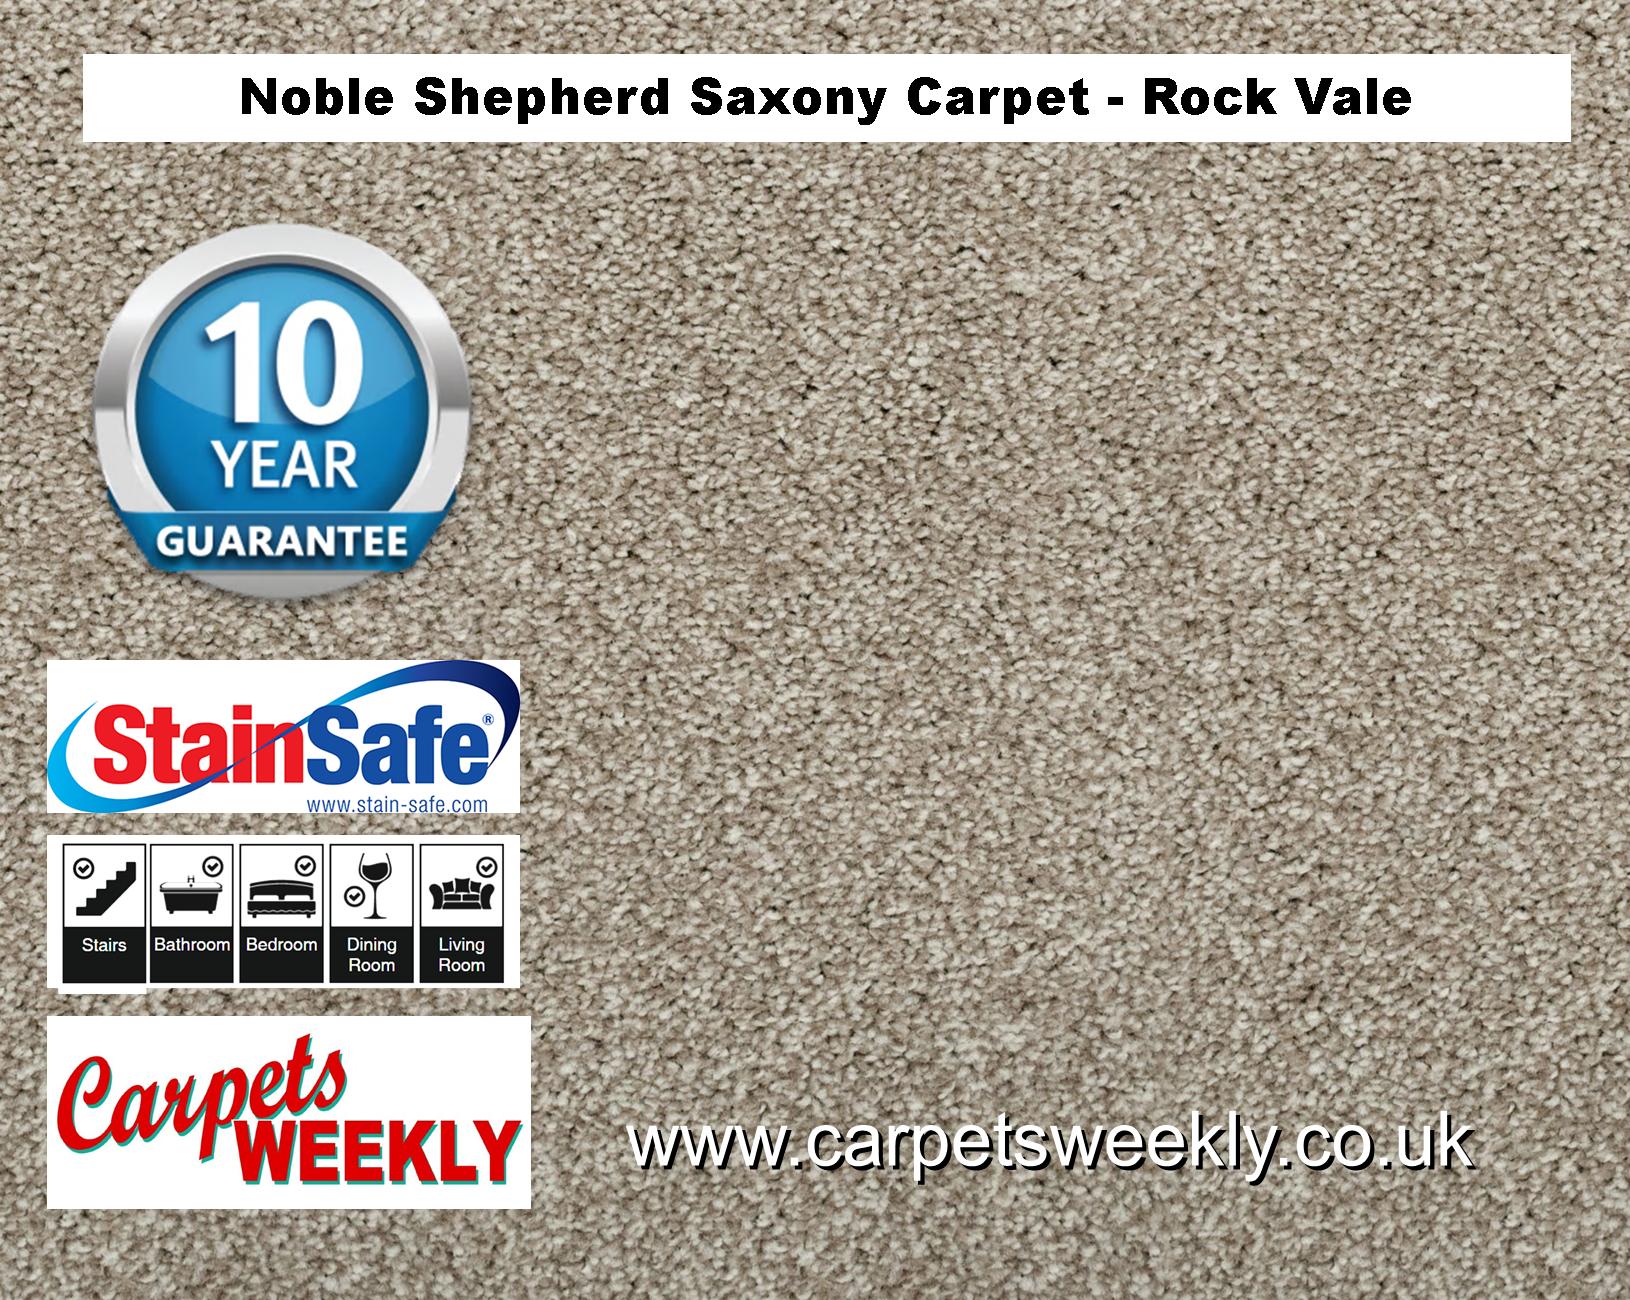 Noble Shepherd Saxony Carpet from Carpets Weekly Rock Vale (785)